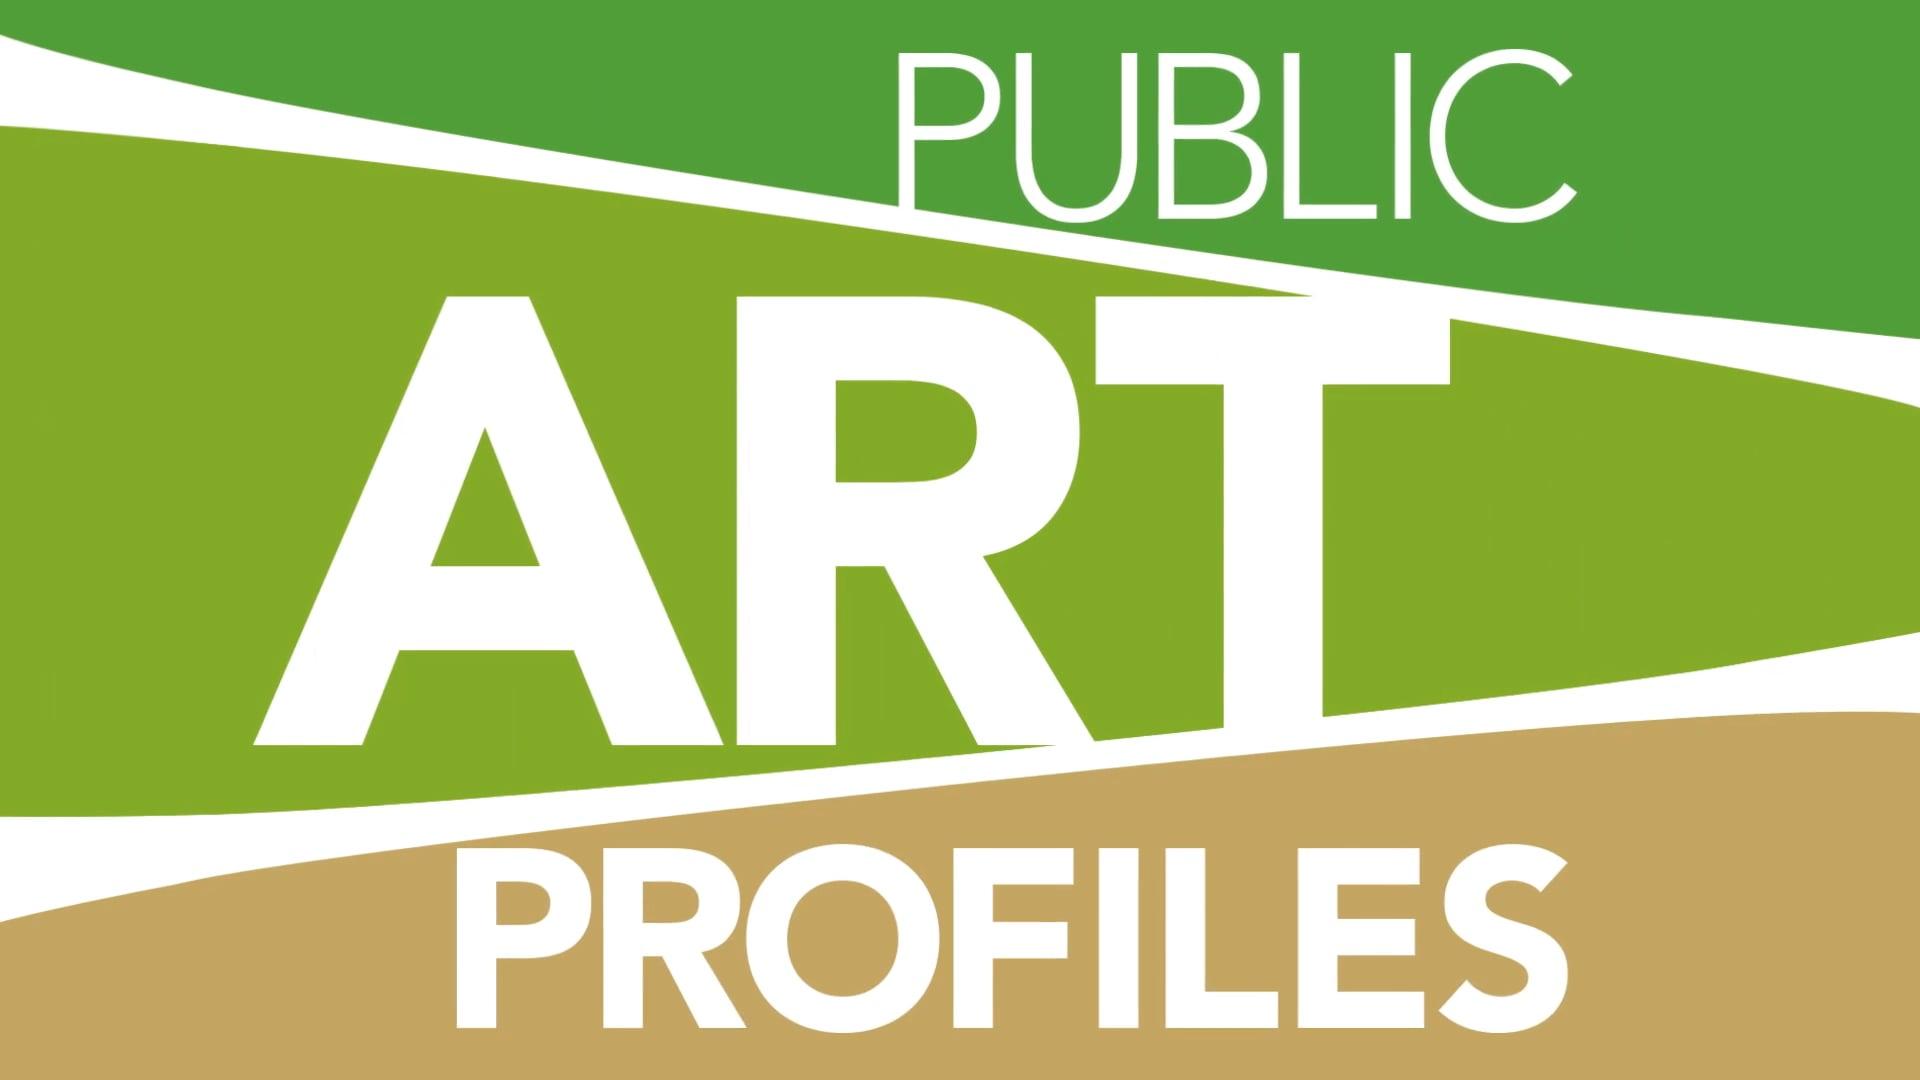 Public Art Profiles: The Healing